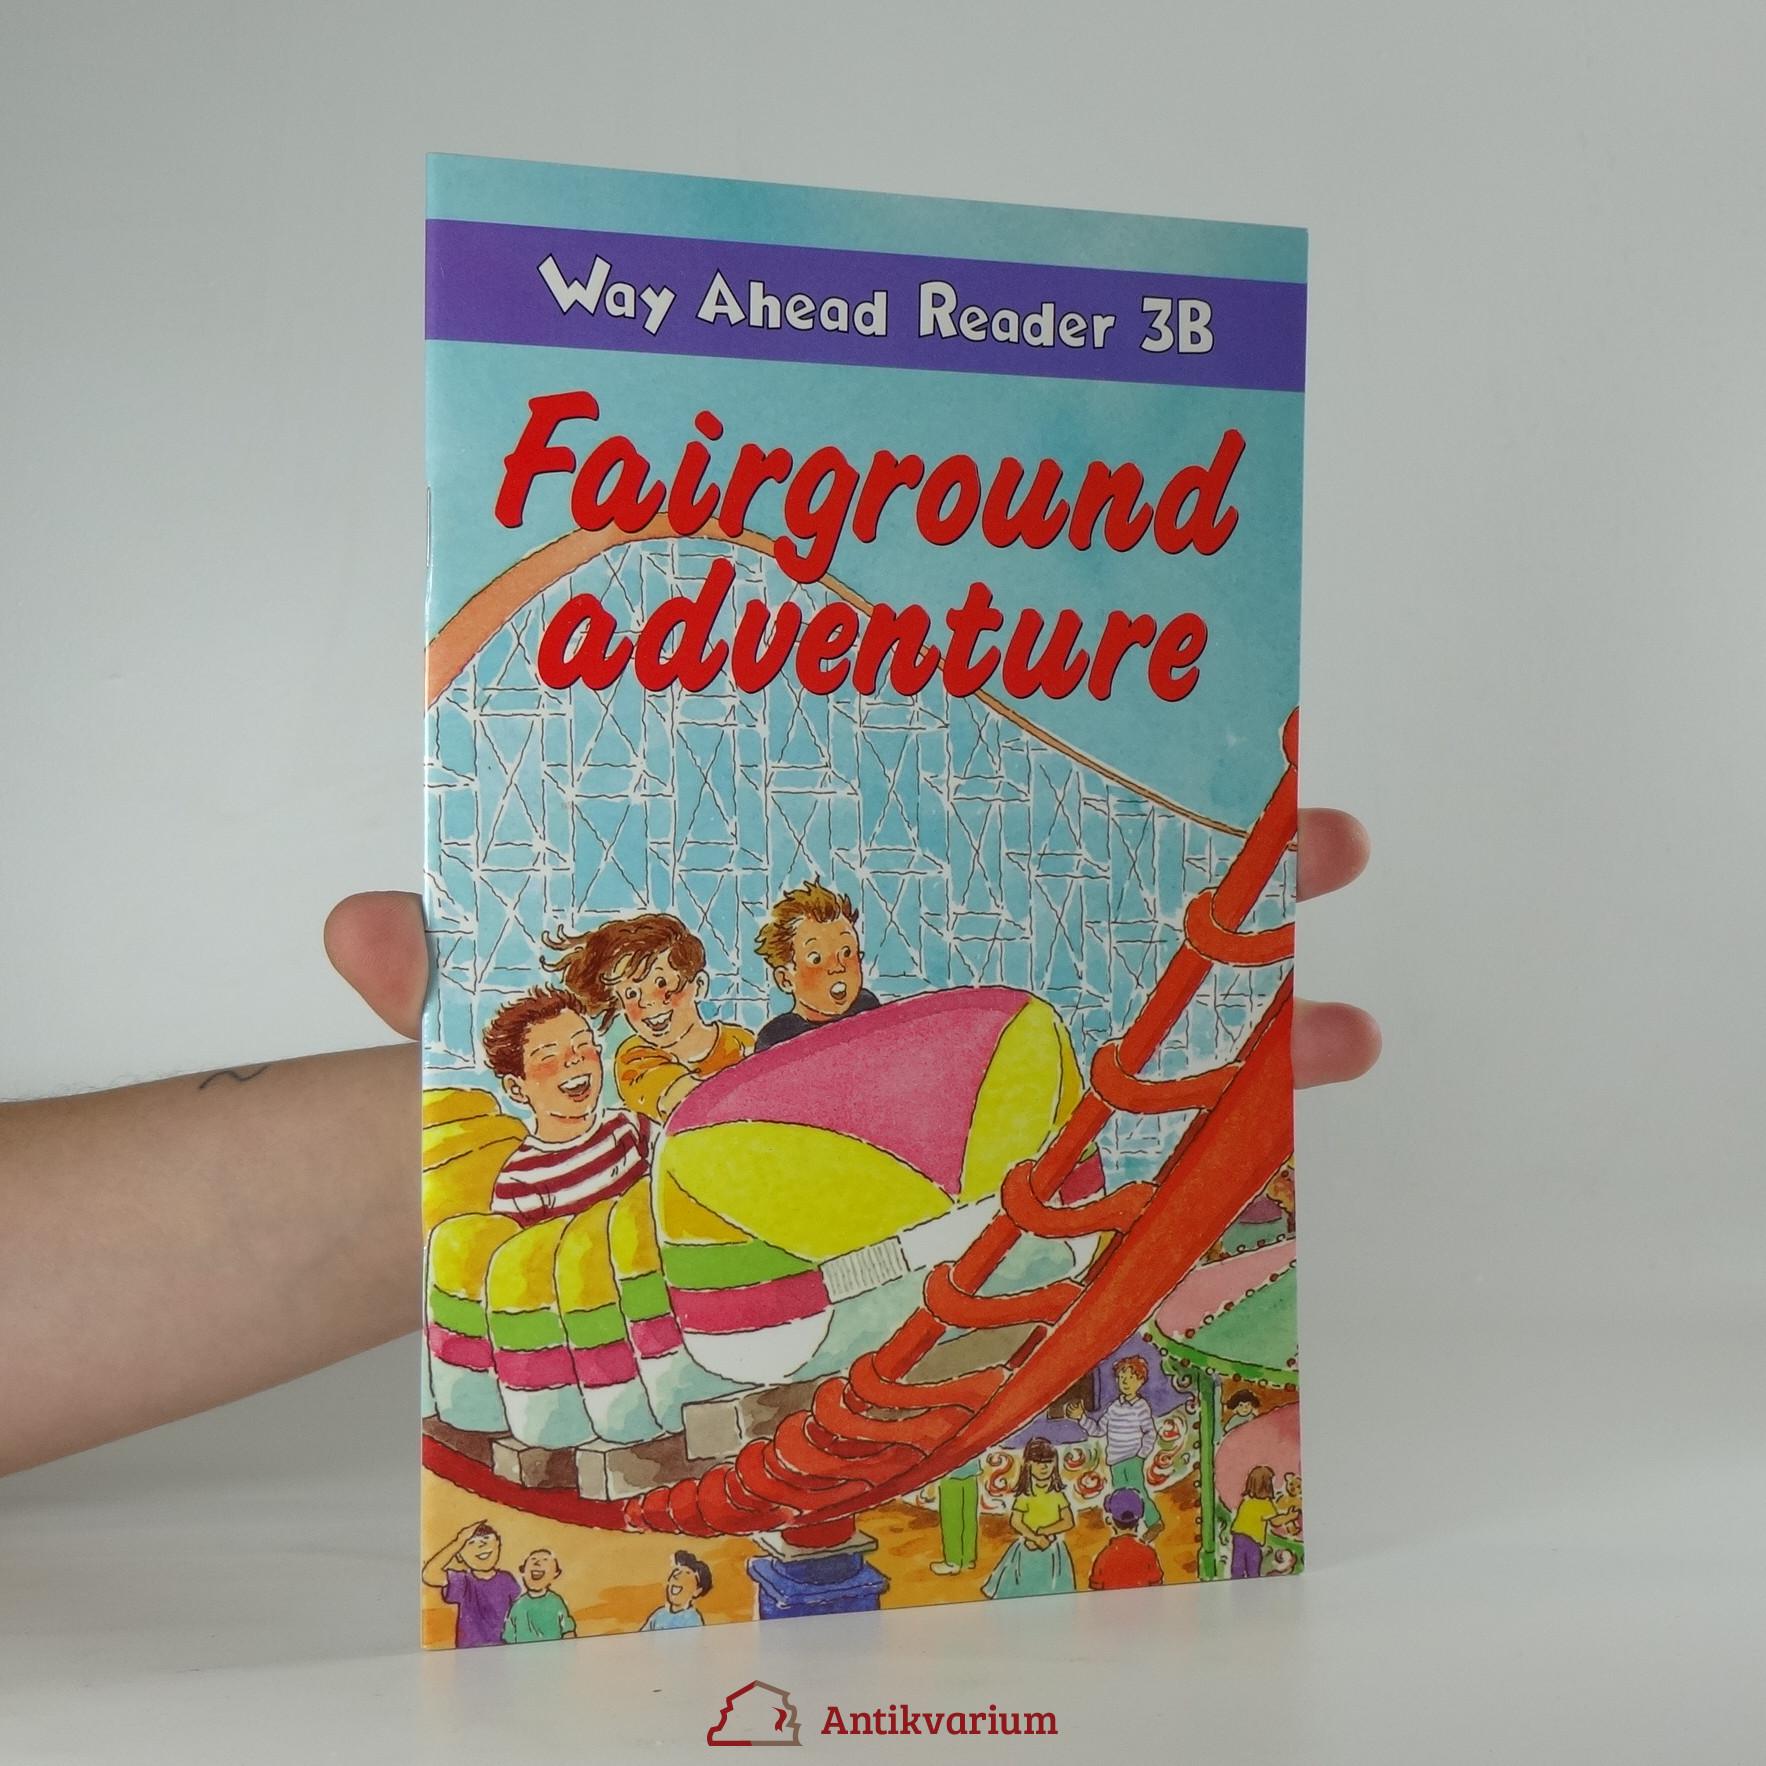 antikvární kniha Fairground adventure. Way Ahead Reader 38, 1998